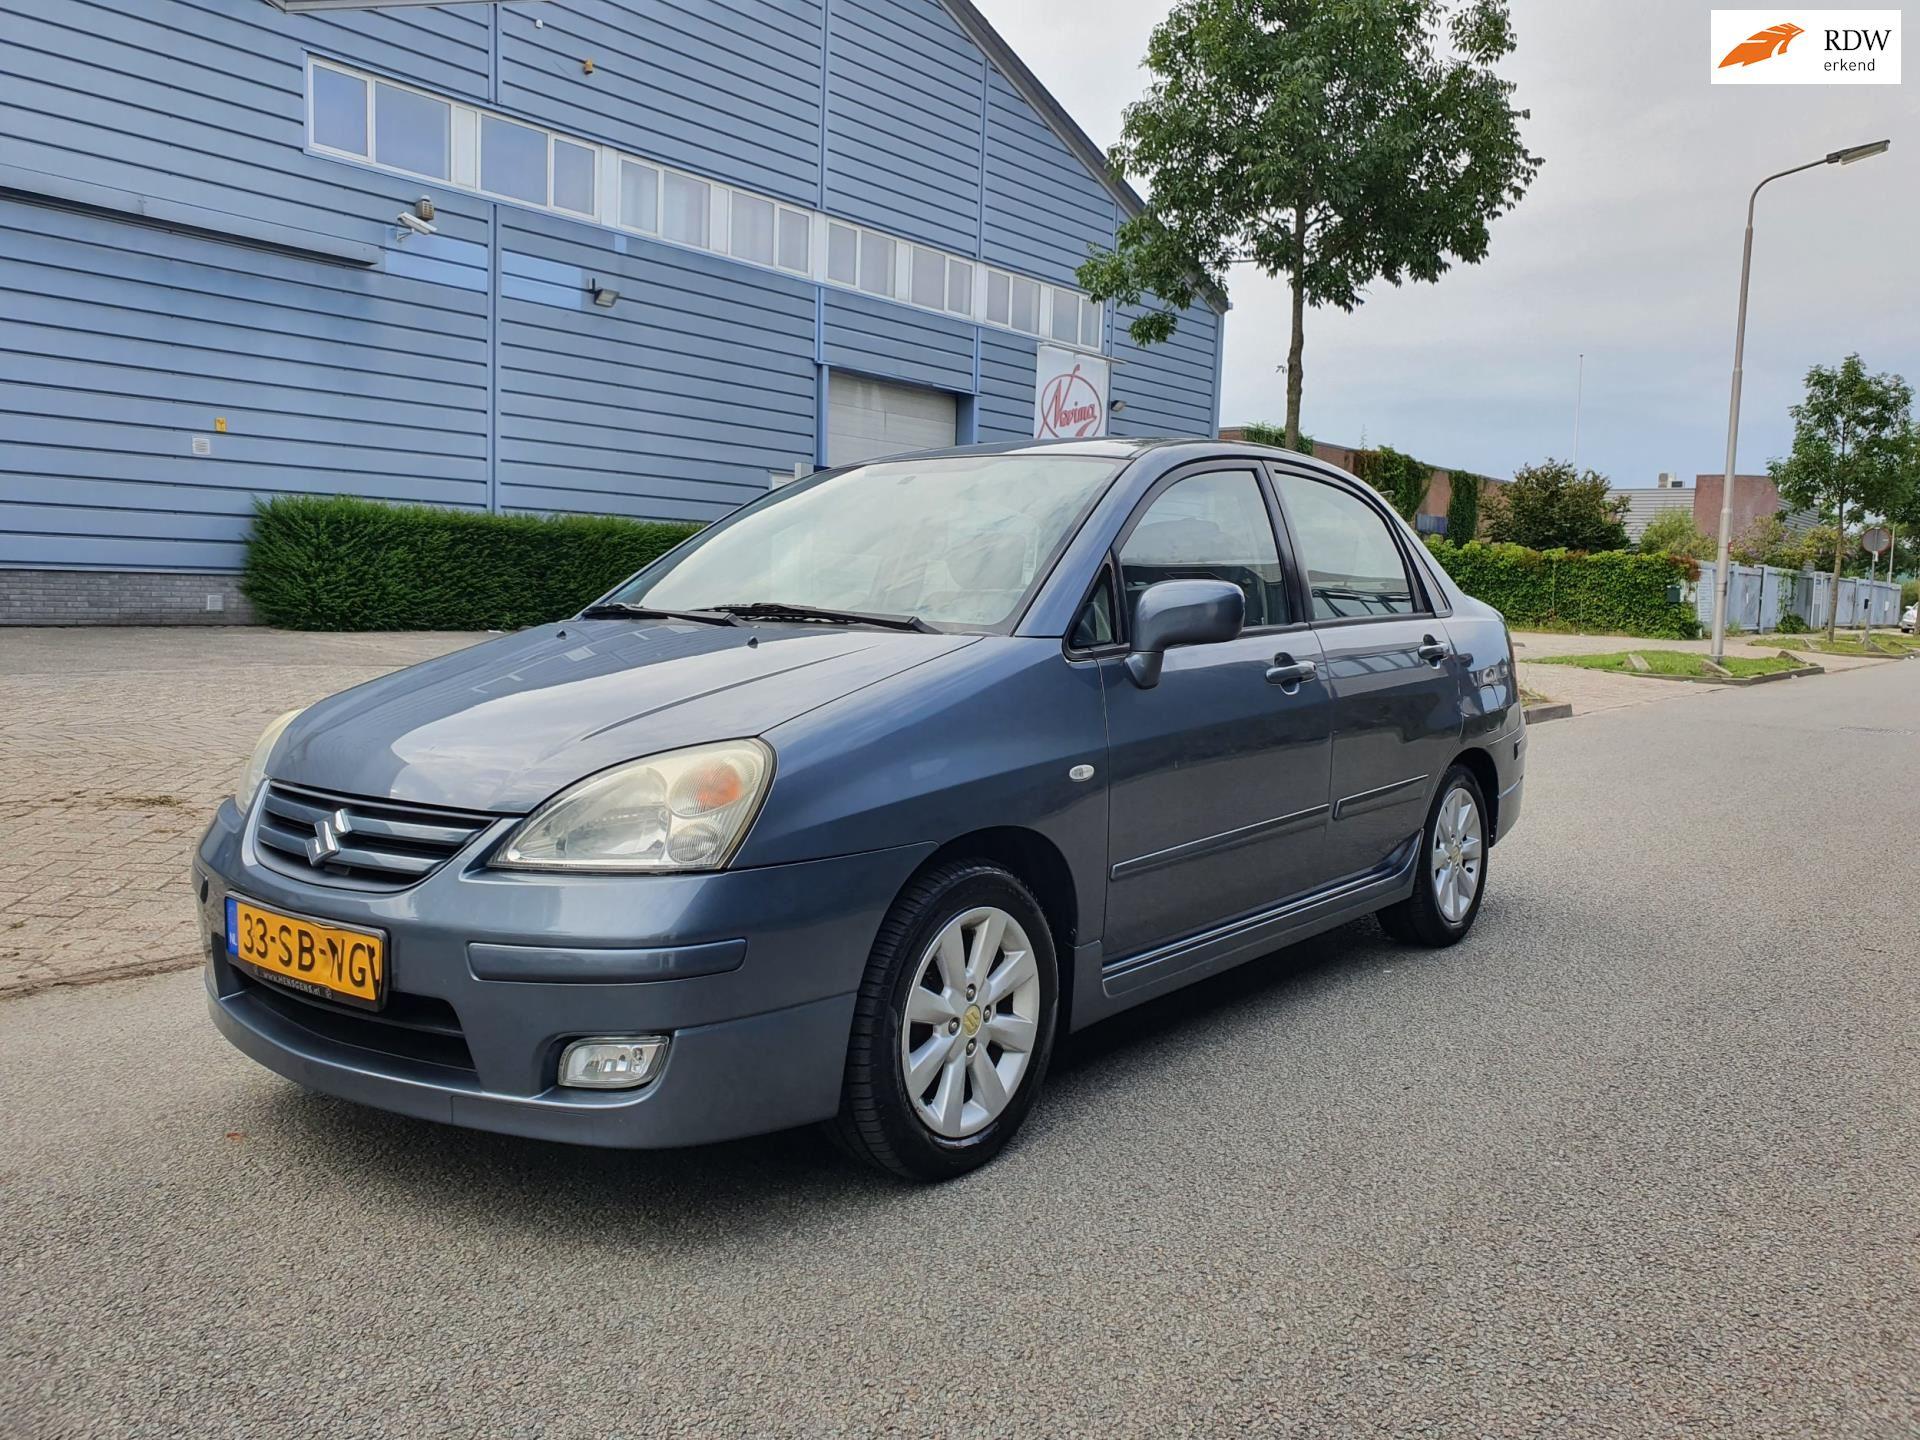 Suzuki Liana occasion - Autohandel Direct